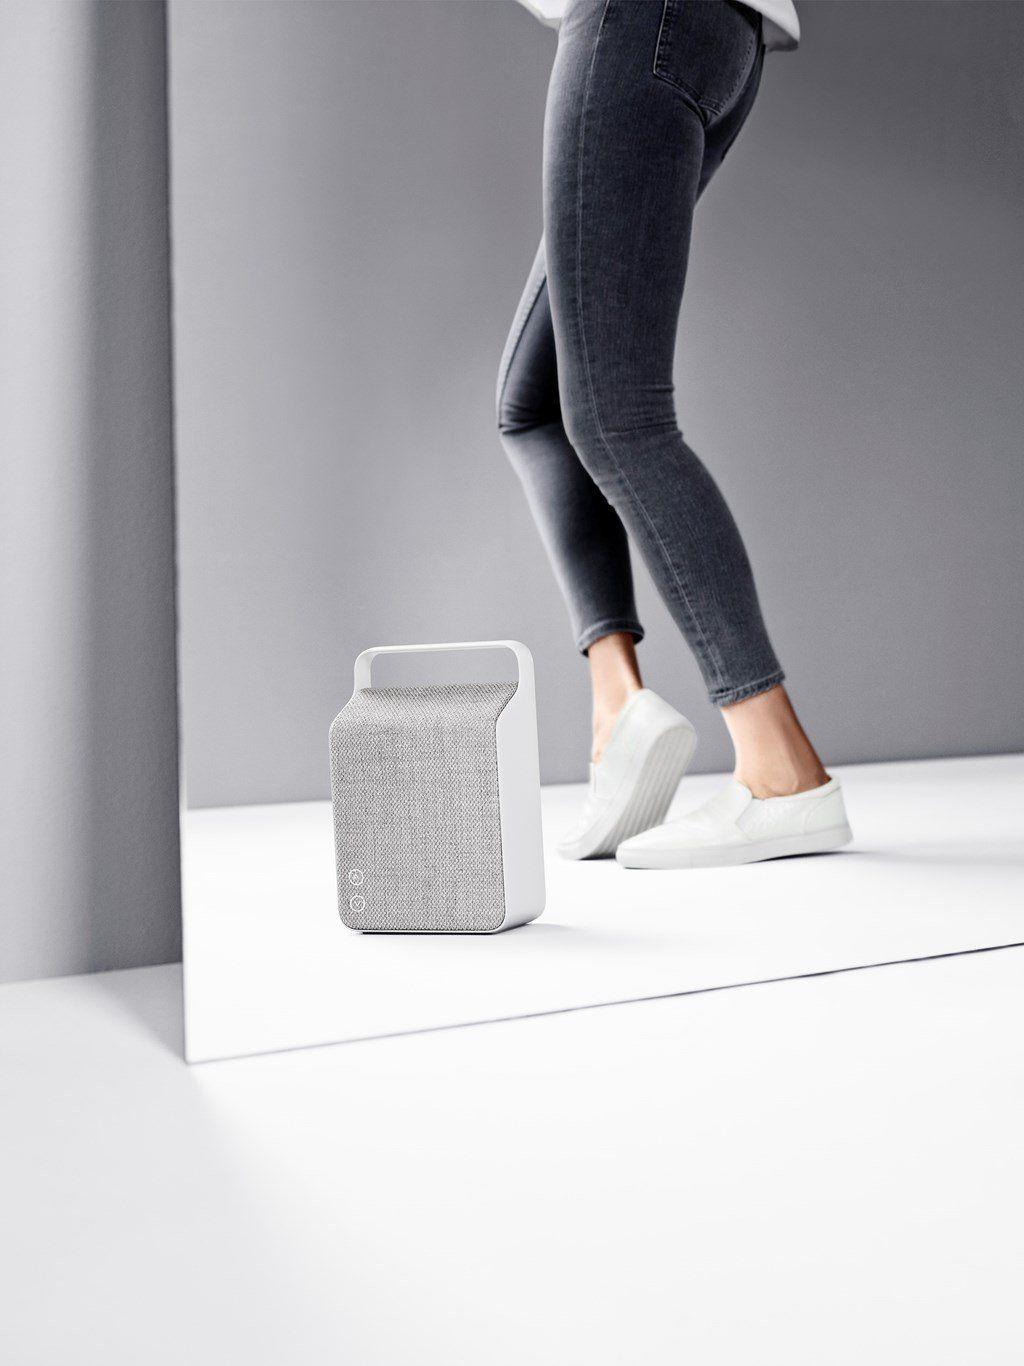 Amazon.com: Vifa Oslo Compact Rechargeable Hi-Resolution Bluetooth Portable Speaker- Pebble Grey: Quantum Networks